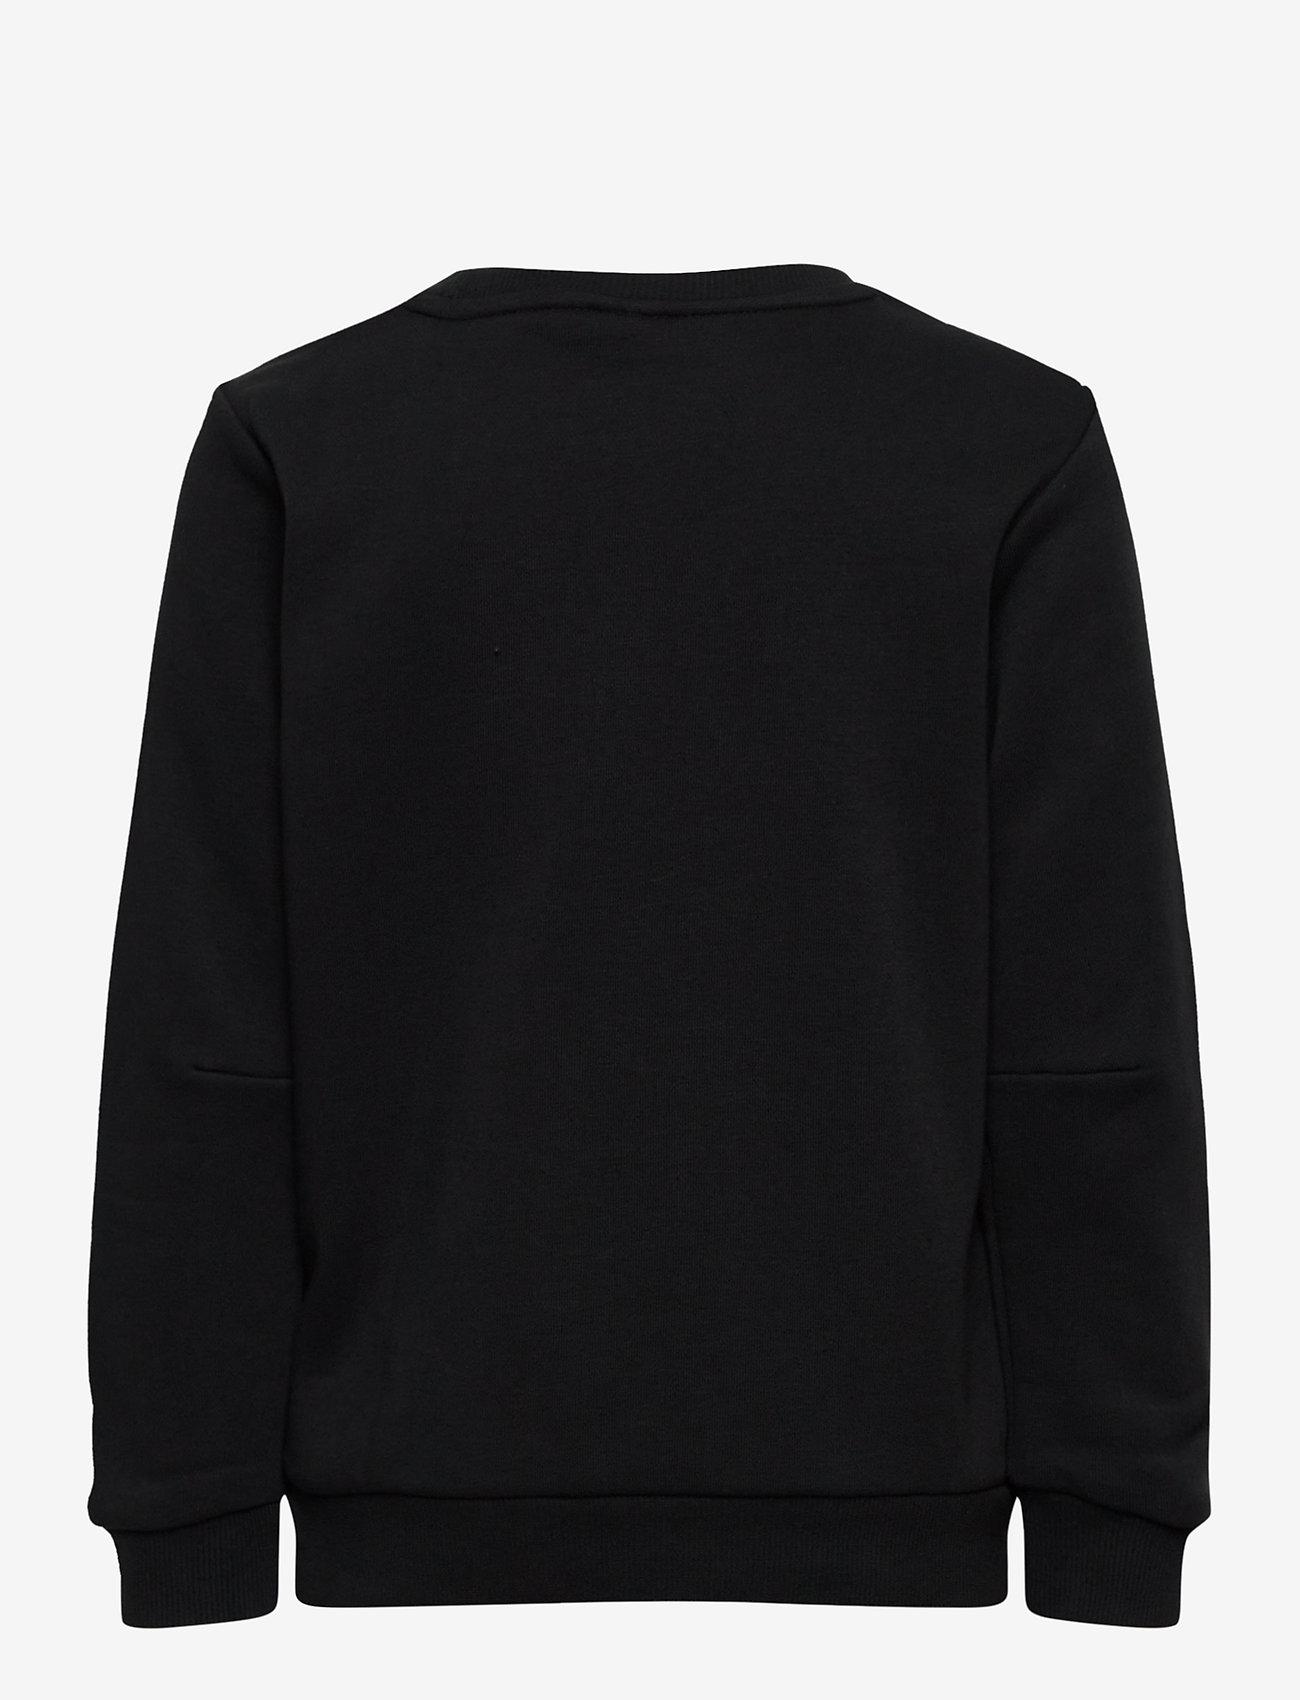 adidas Performance - JB MH CREW - sweatshirts - black/white - 1